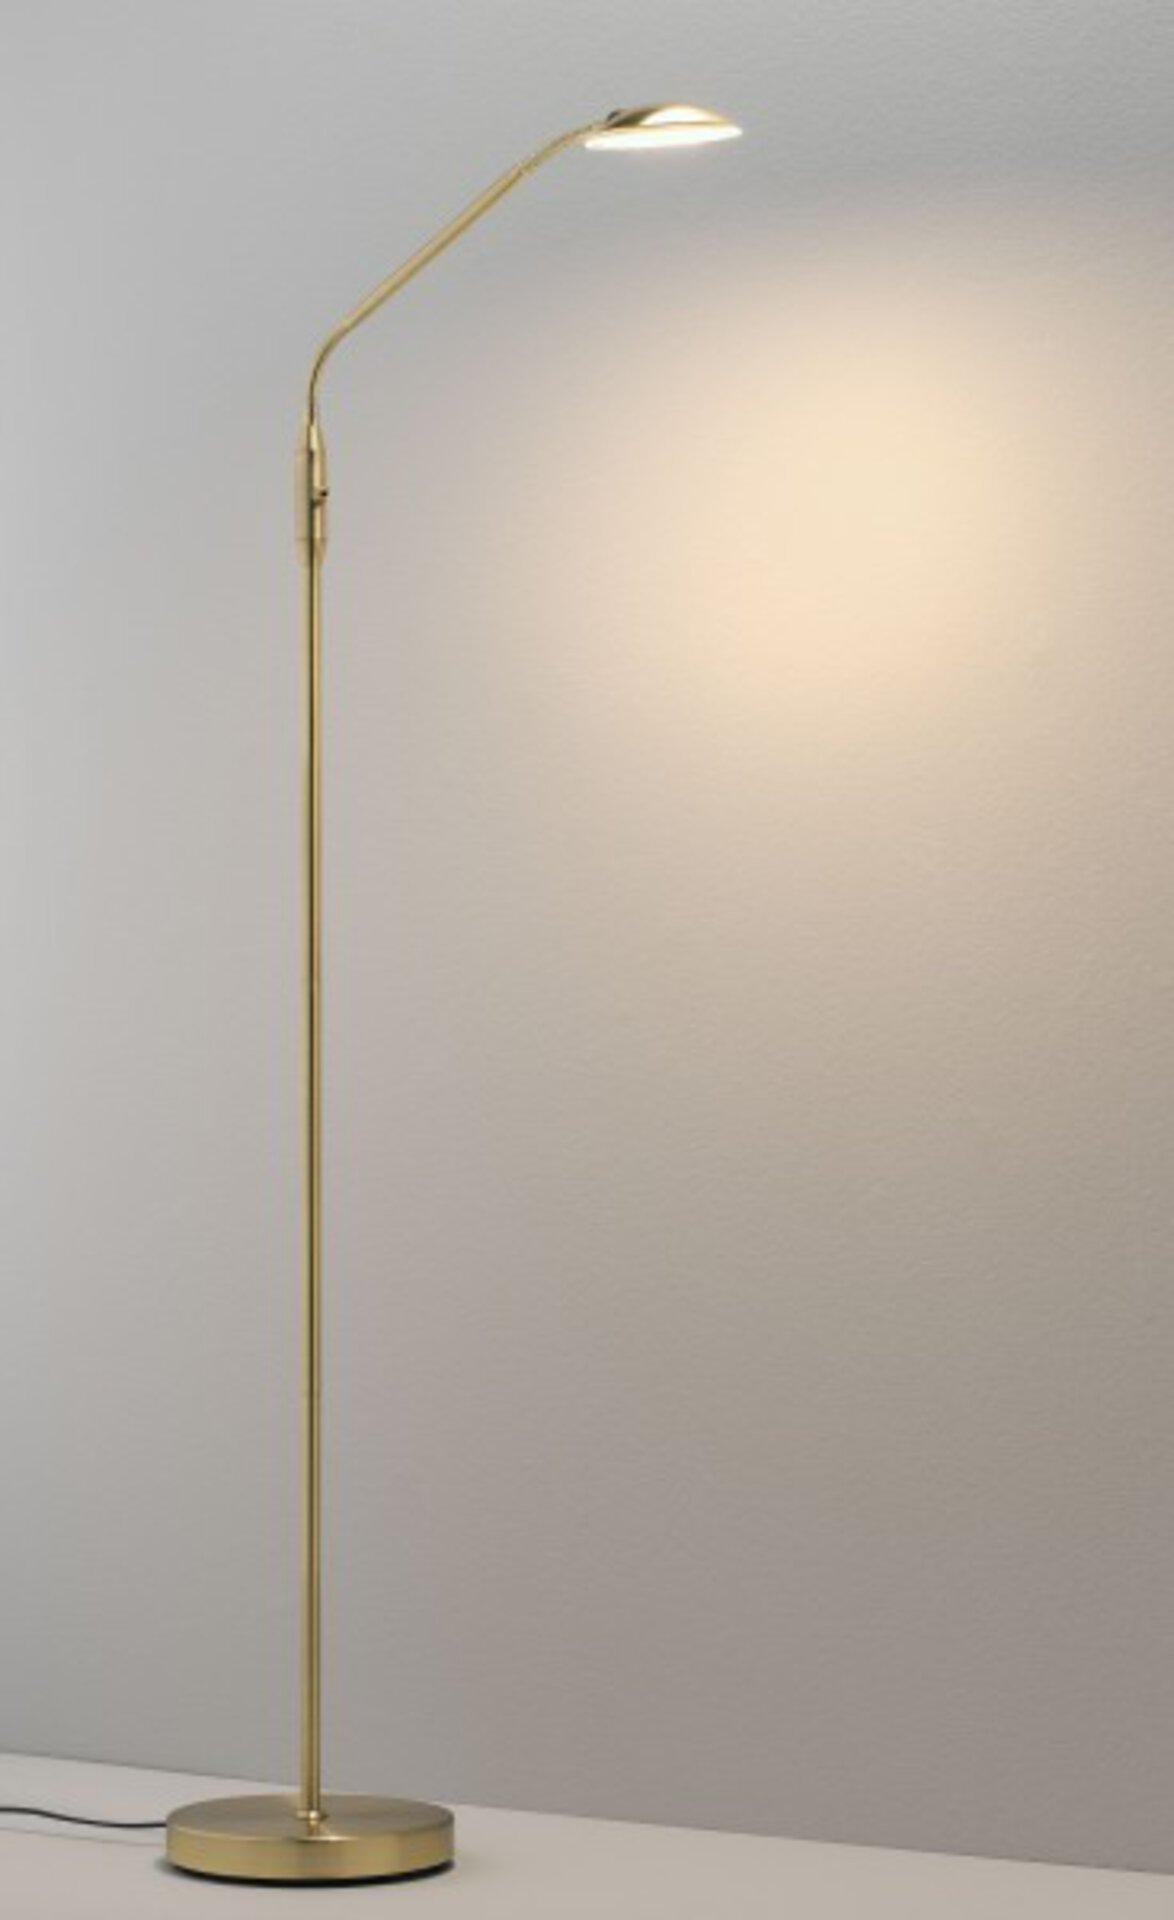 Stehleuchte Pluto Casa Nova Metall 23 x 165 x 23 cm